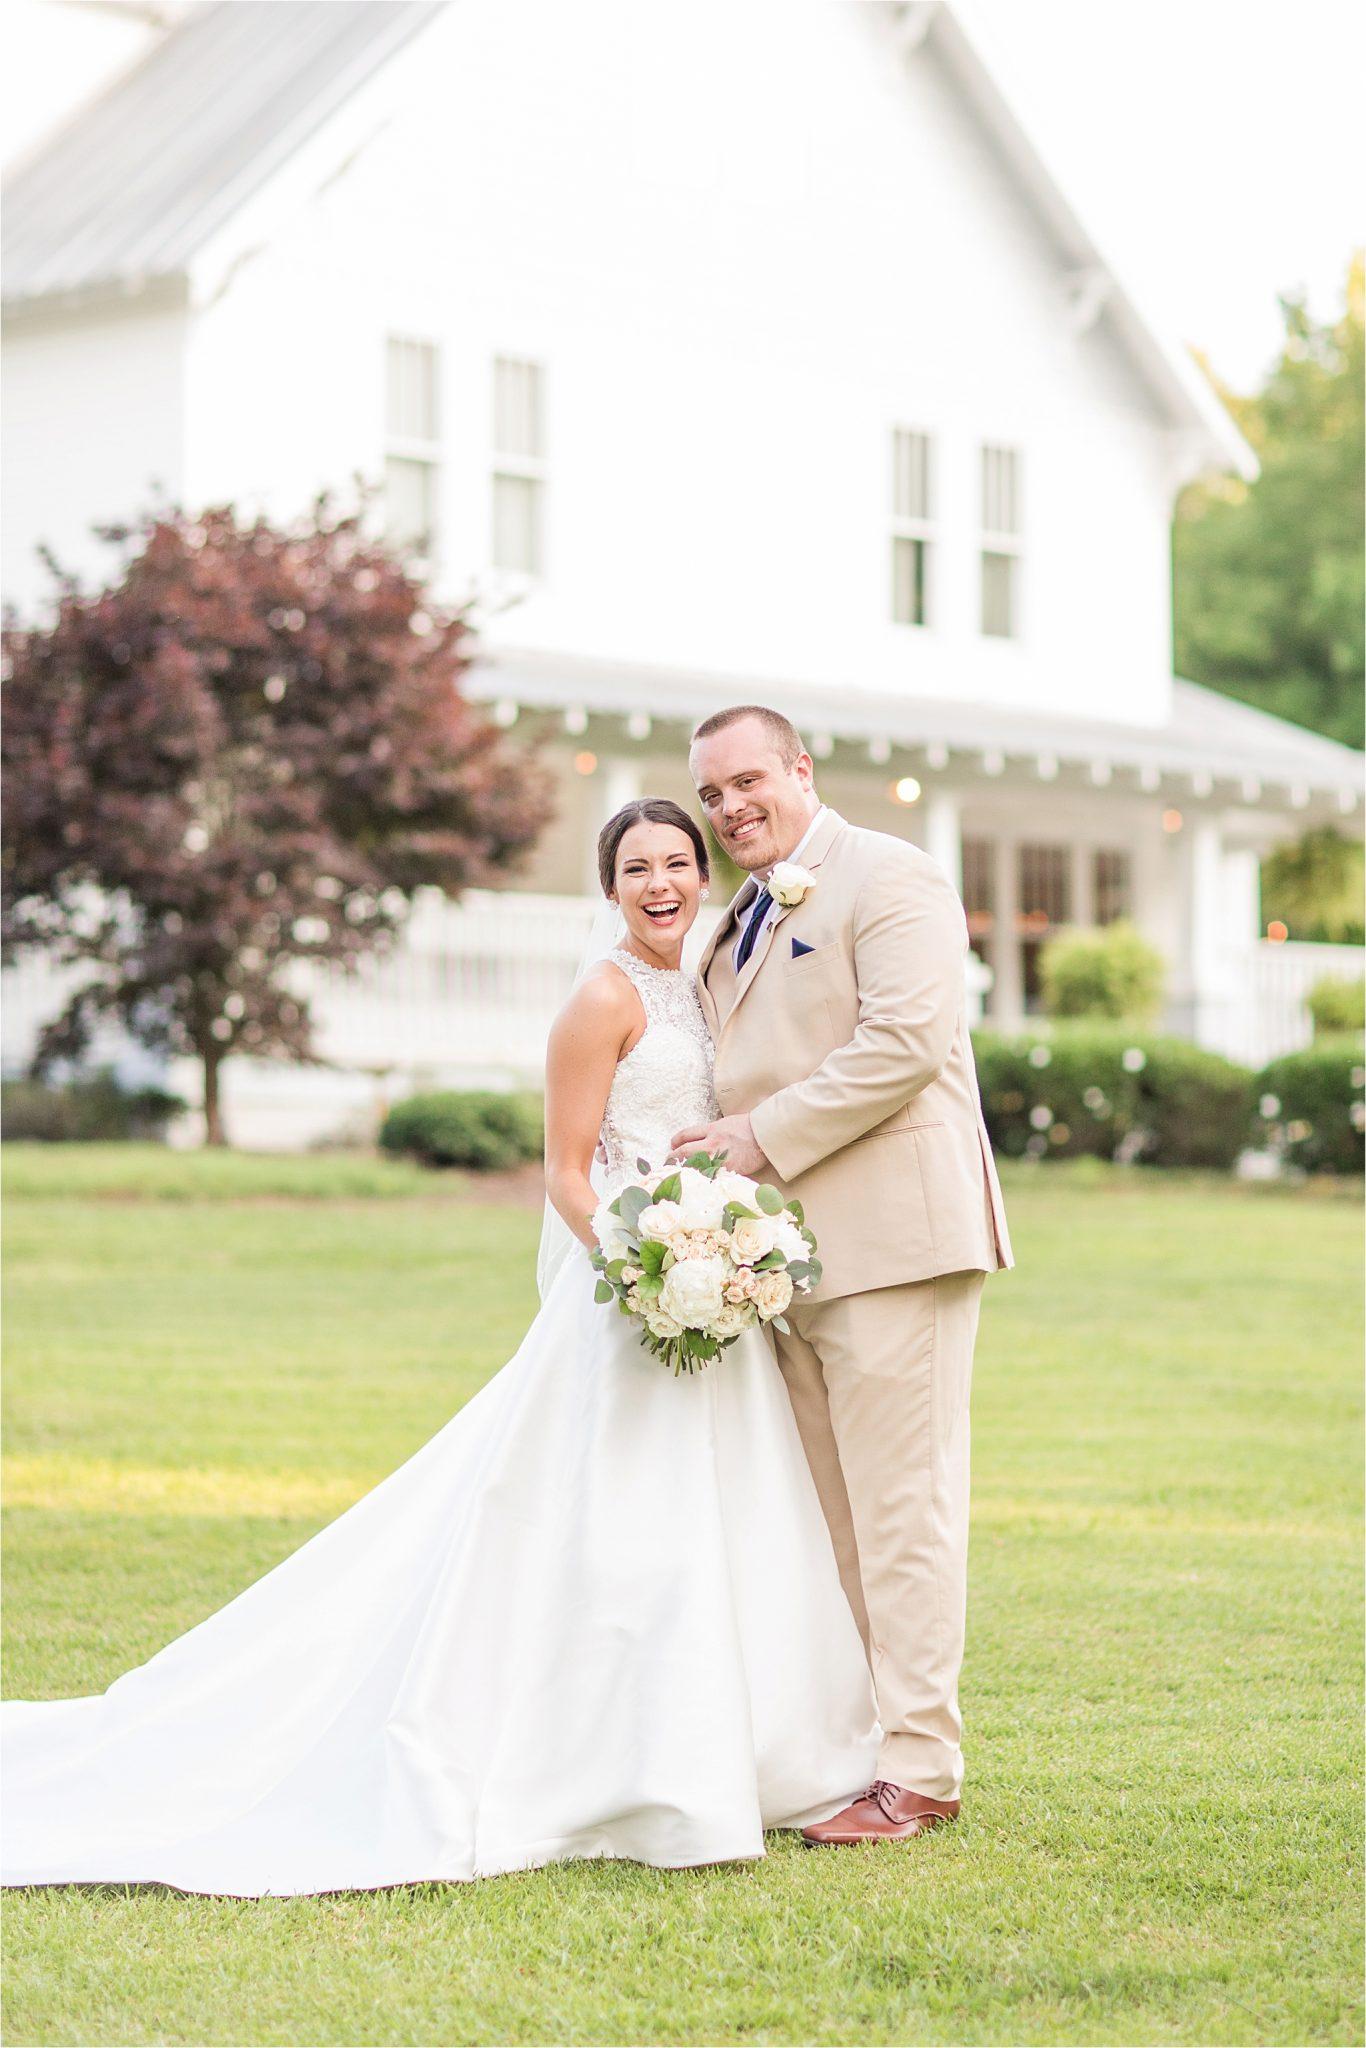 Sonnet House, Birmingham Alabama Wedding Photographer, Candid wedding shots